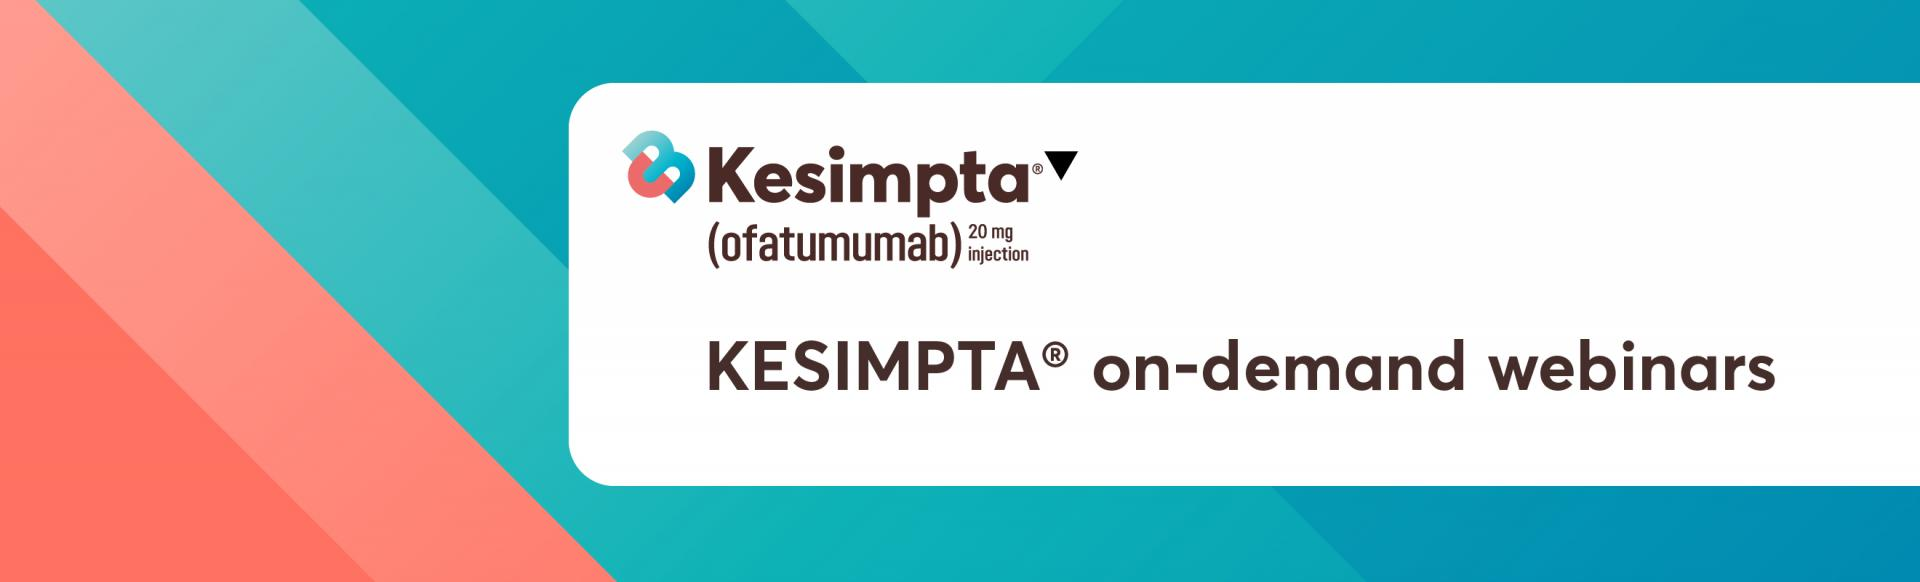 Top banner. Kesimpta branded banner. Kesimpta on-demand webinars.